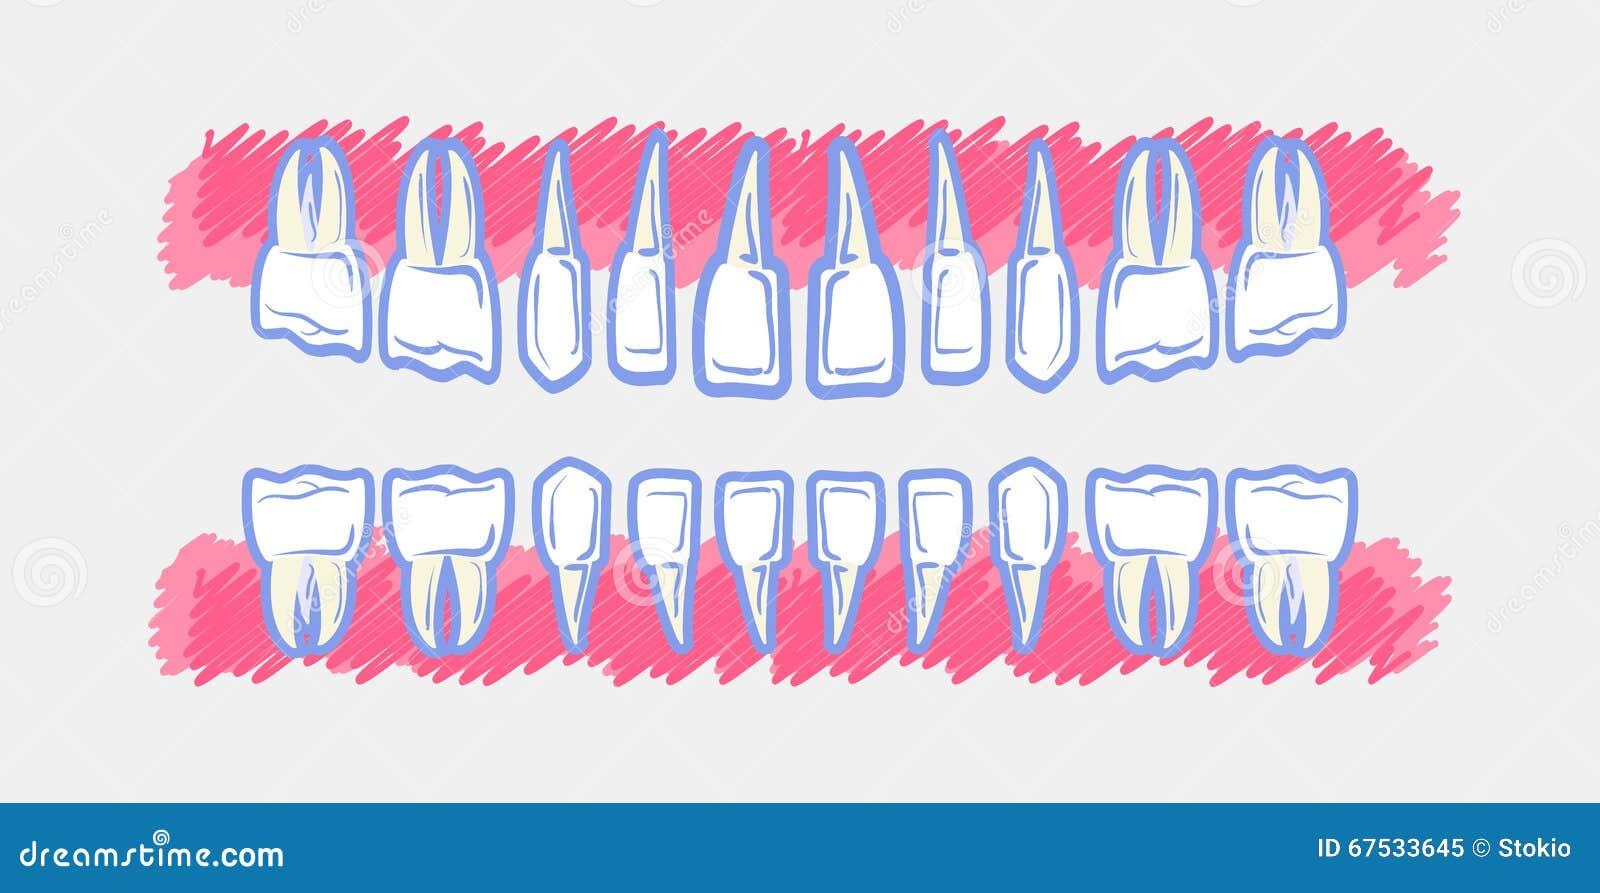 Children Teeth anatomy stock vector. Illustration of diagram - 67533645